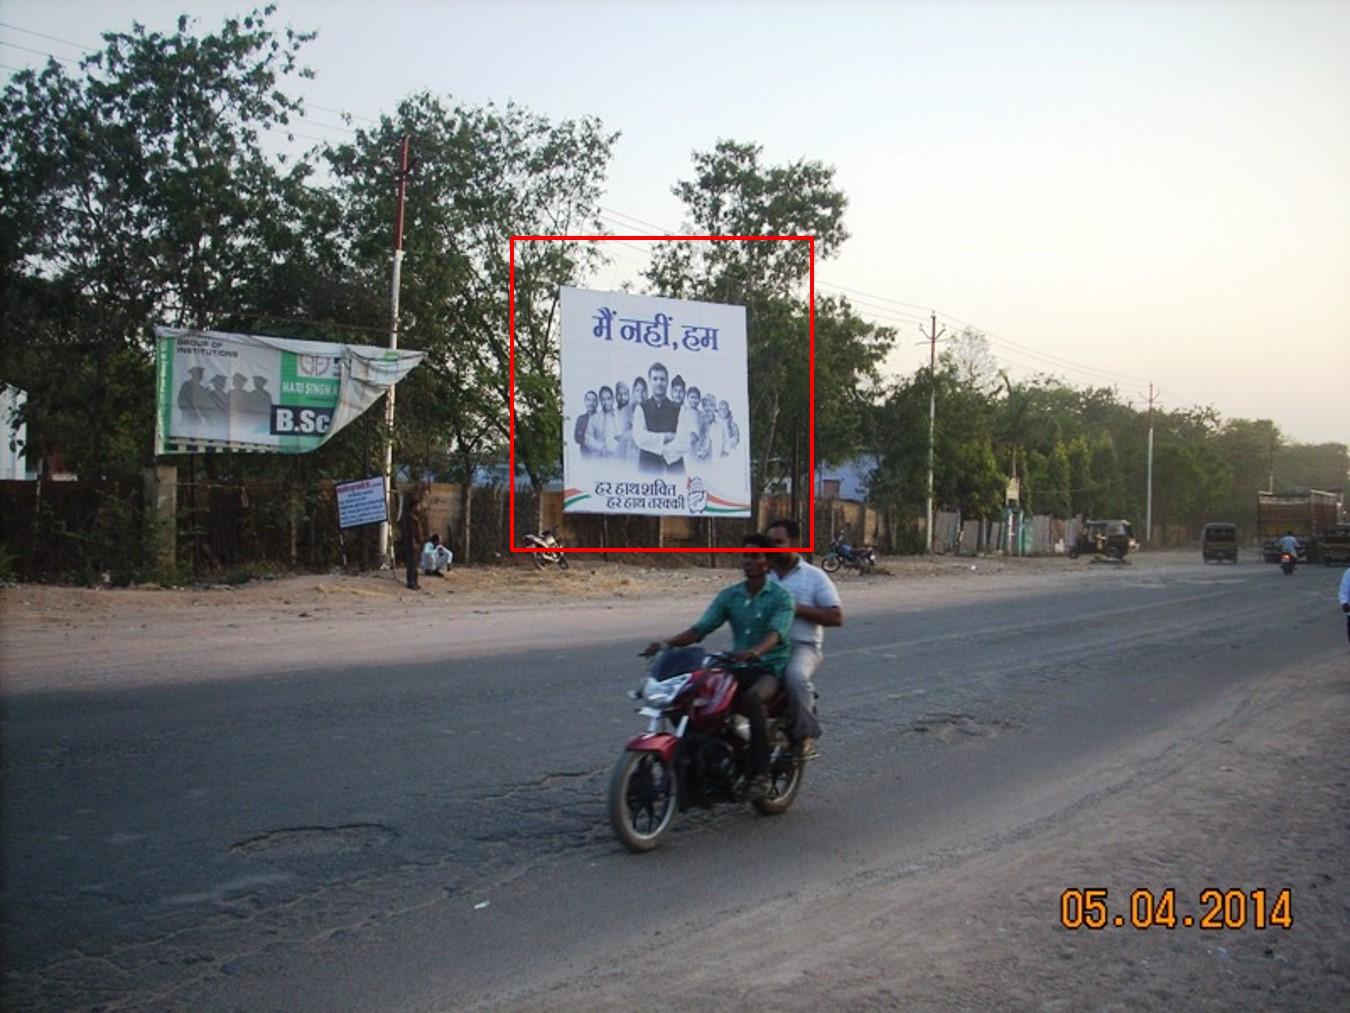 Risala Crossing, Jhansi